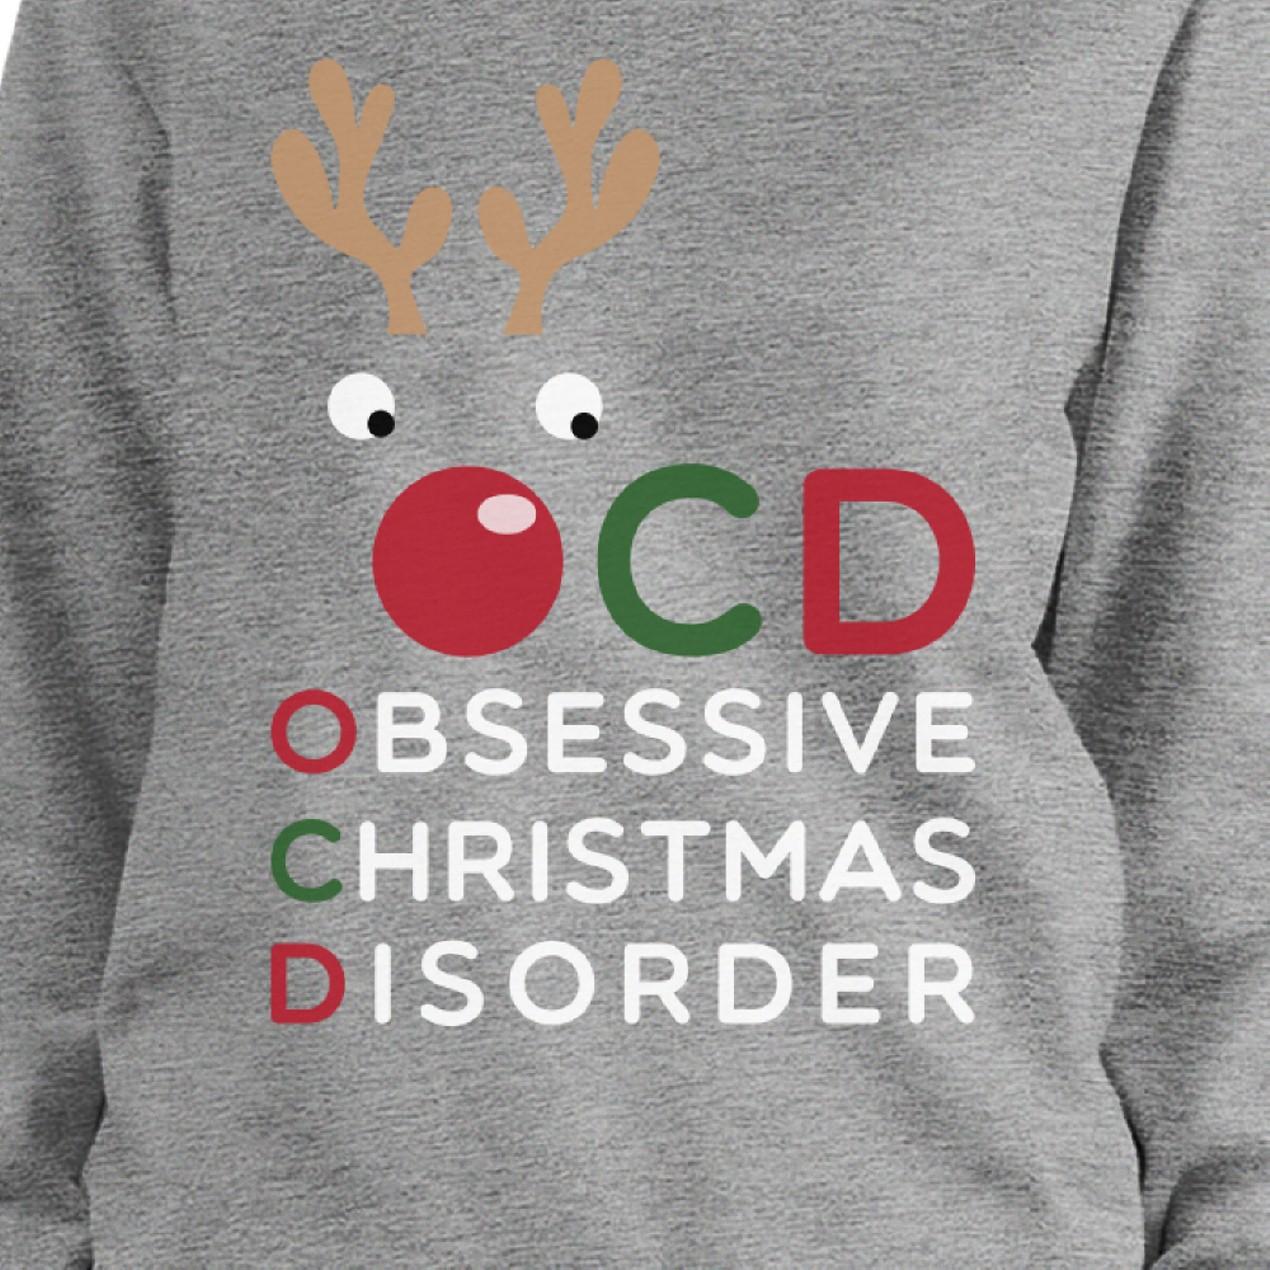 OCD Obsessive Christmas Disorder Sweatshirt Pullover Fleece Sweater ...